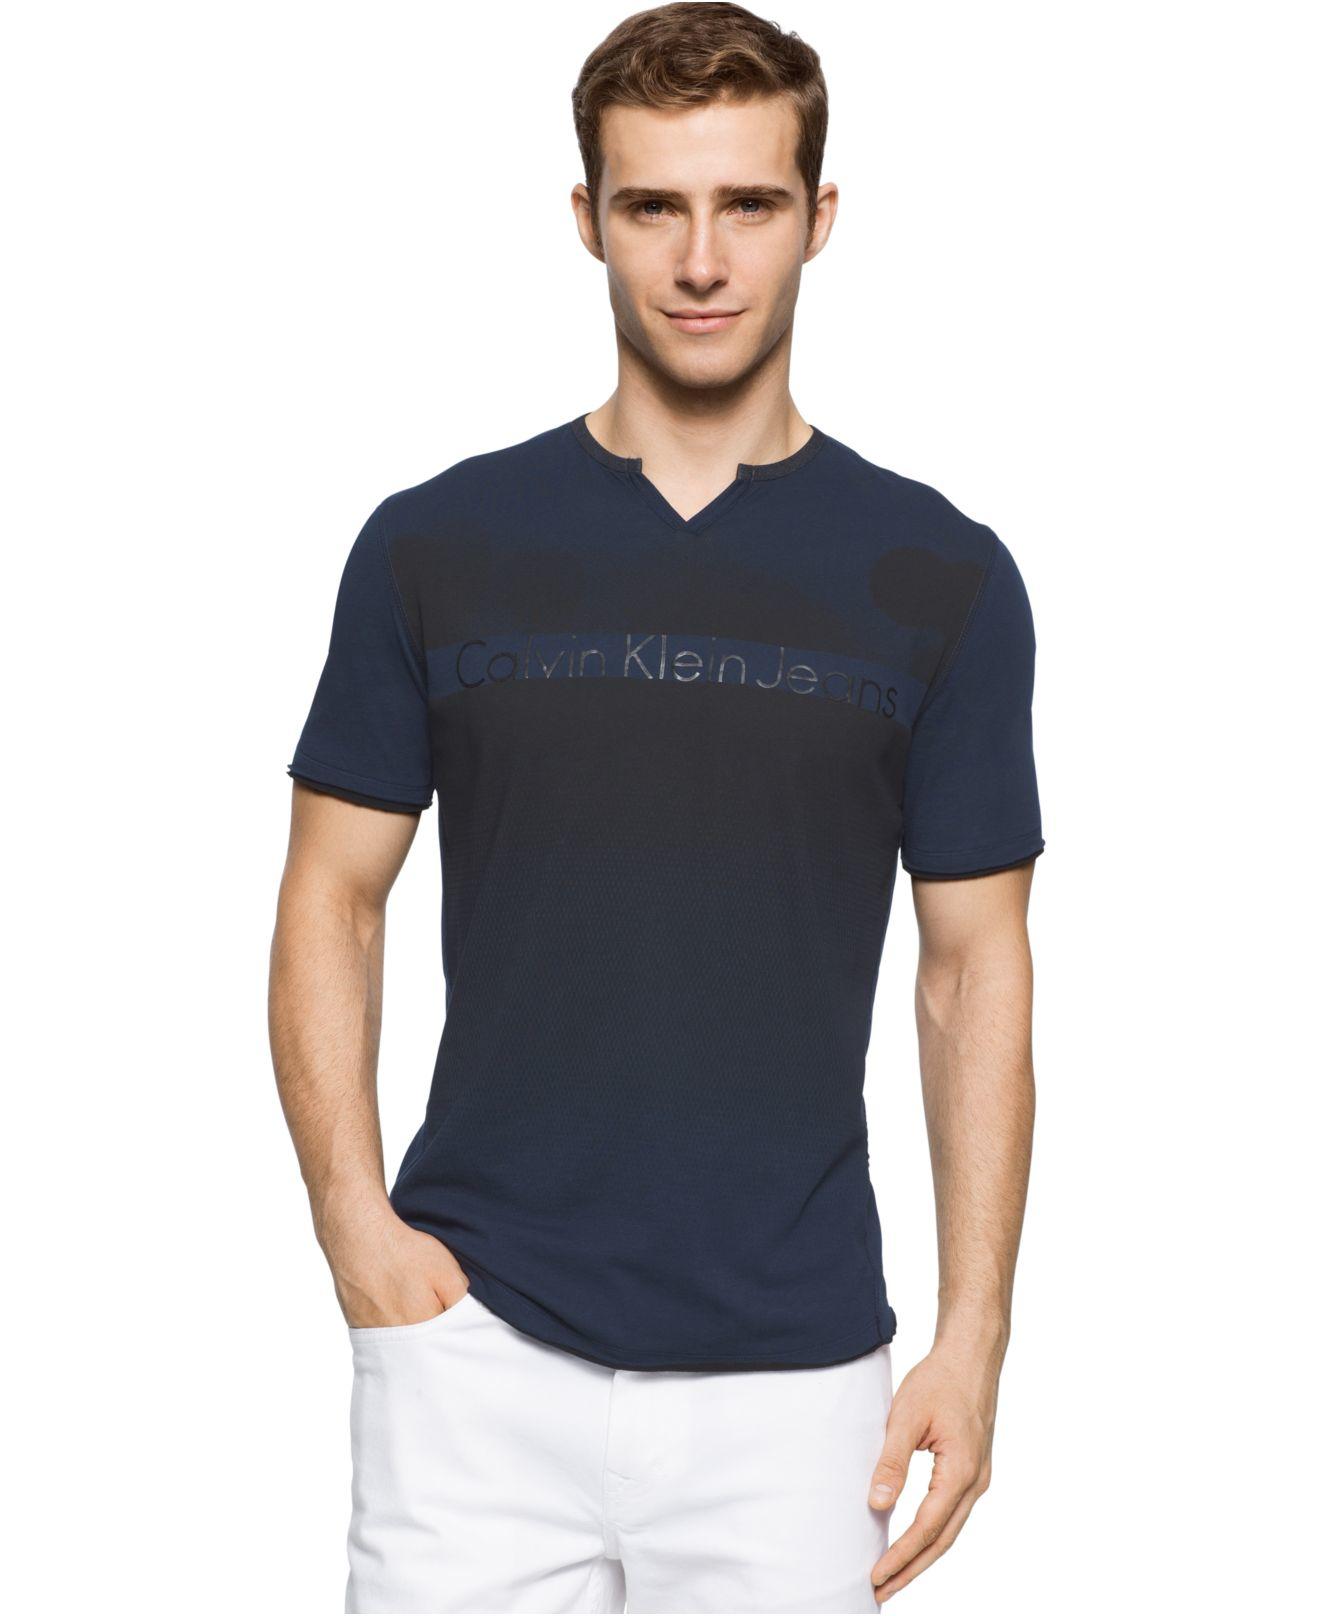 calvin klein jeans men 39 s pixel flare graphic print logo split neck t shirt in blue for men lyst. Black Bedroom Furniture Sets. Home Design Ideas